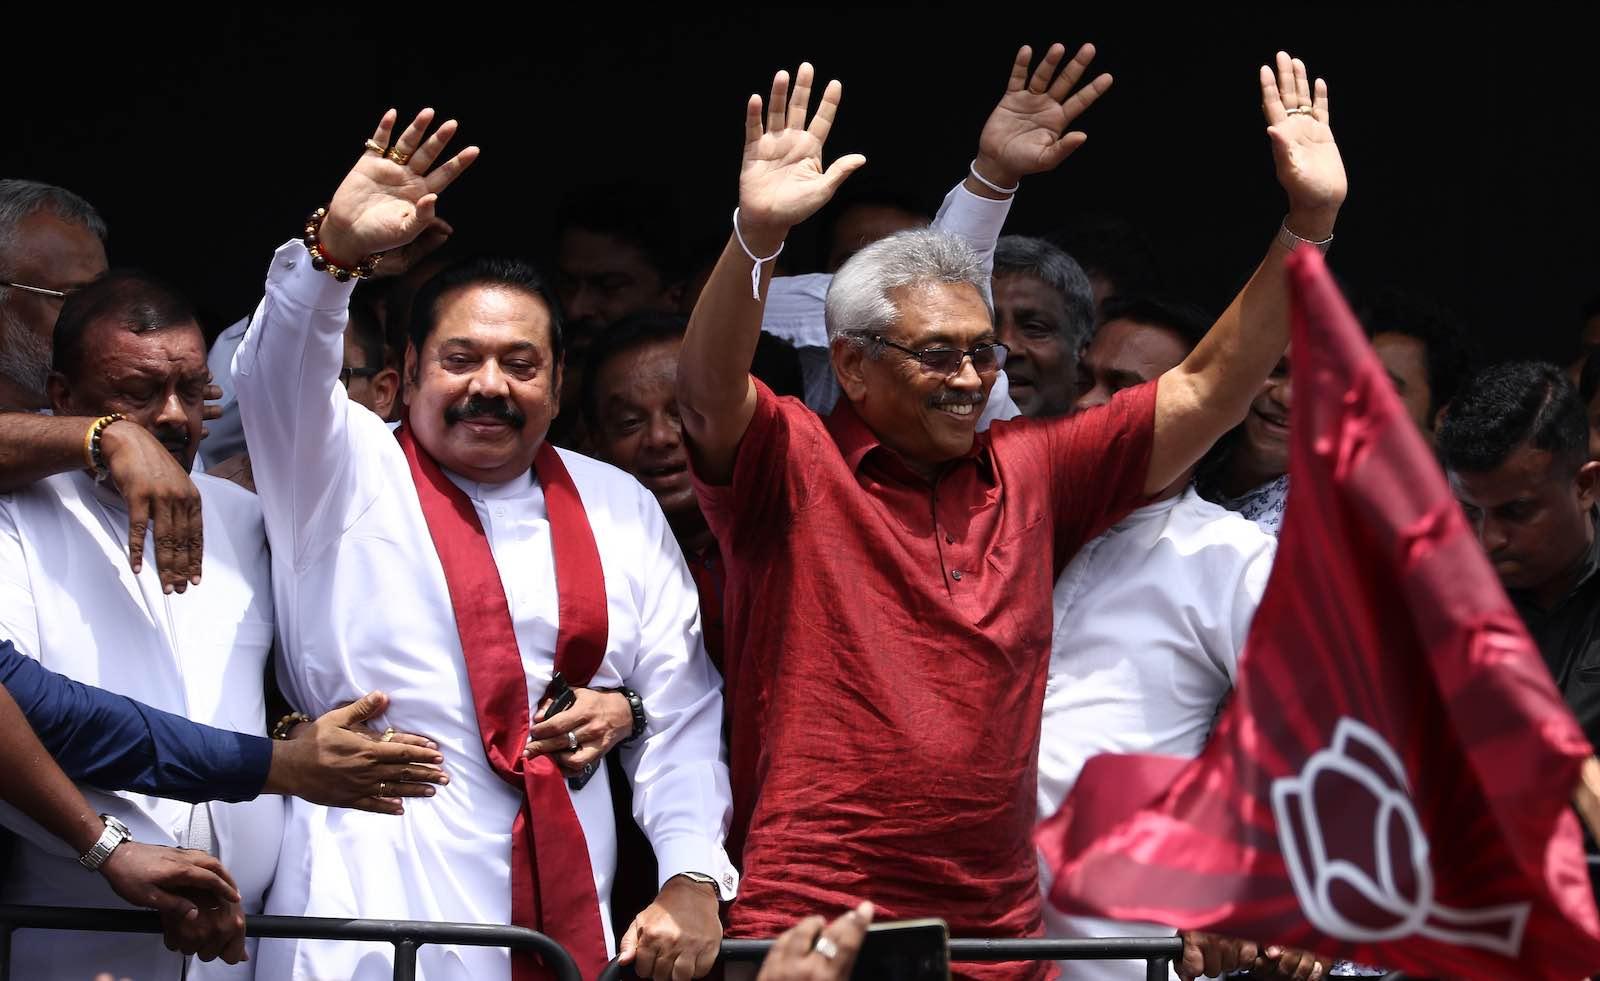 Sri Lankan presidential candidate Gotabaya Rajapaksa (R) and his brother, former president Mahinda Rajapaksa (L), greet supporters in Colombo, 7 October 2019. (Photo by Tharaka Basnayaka/NurPhoto via Getty)